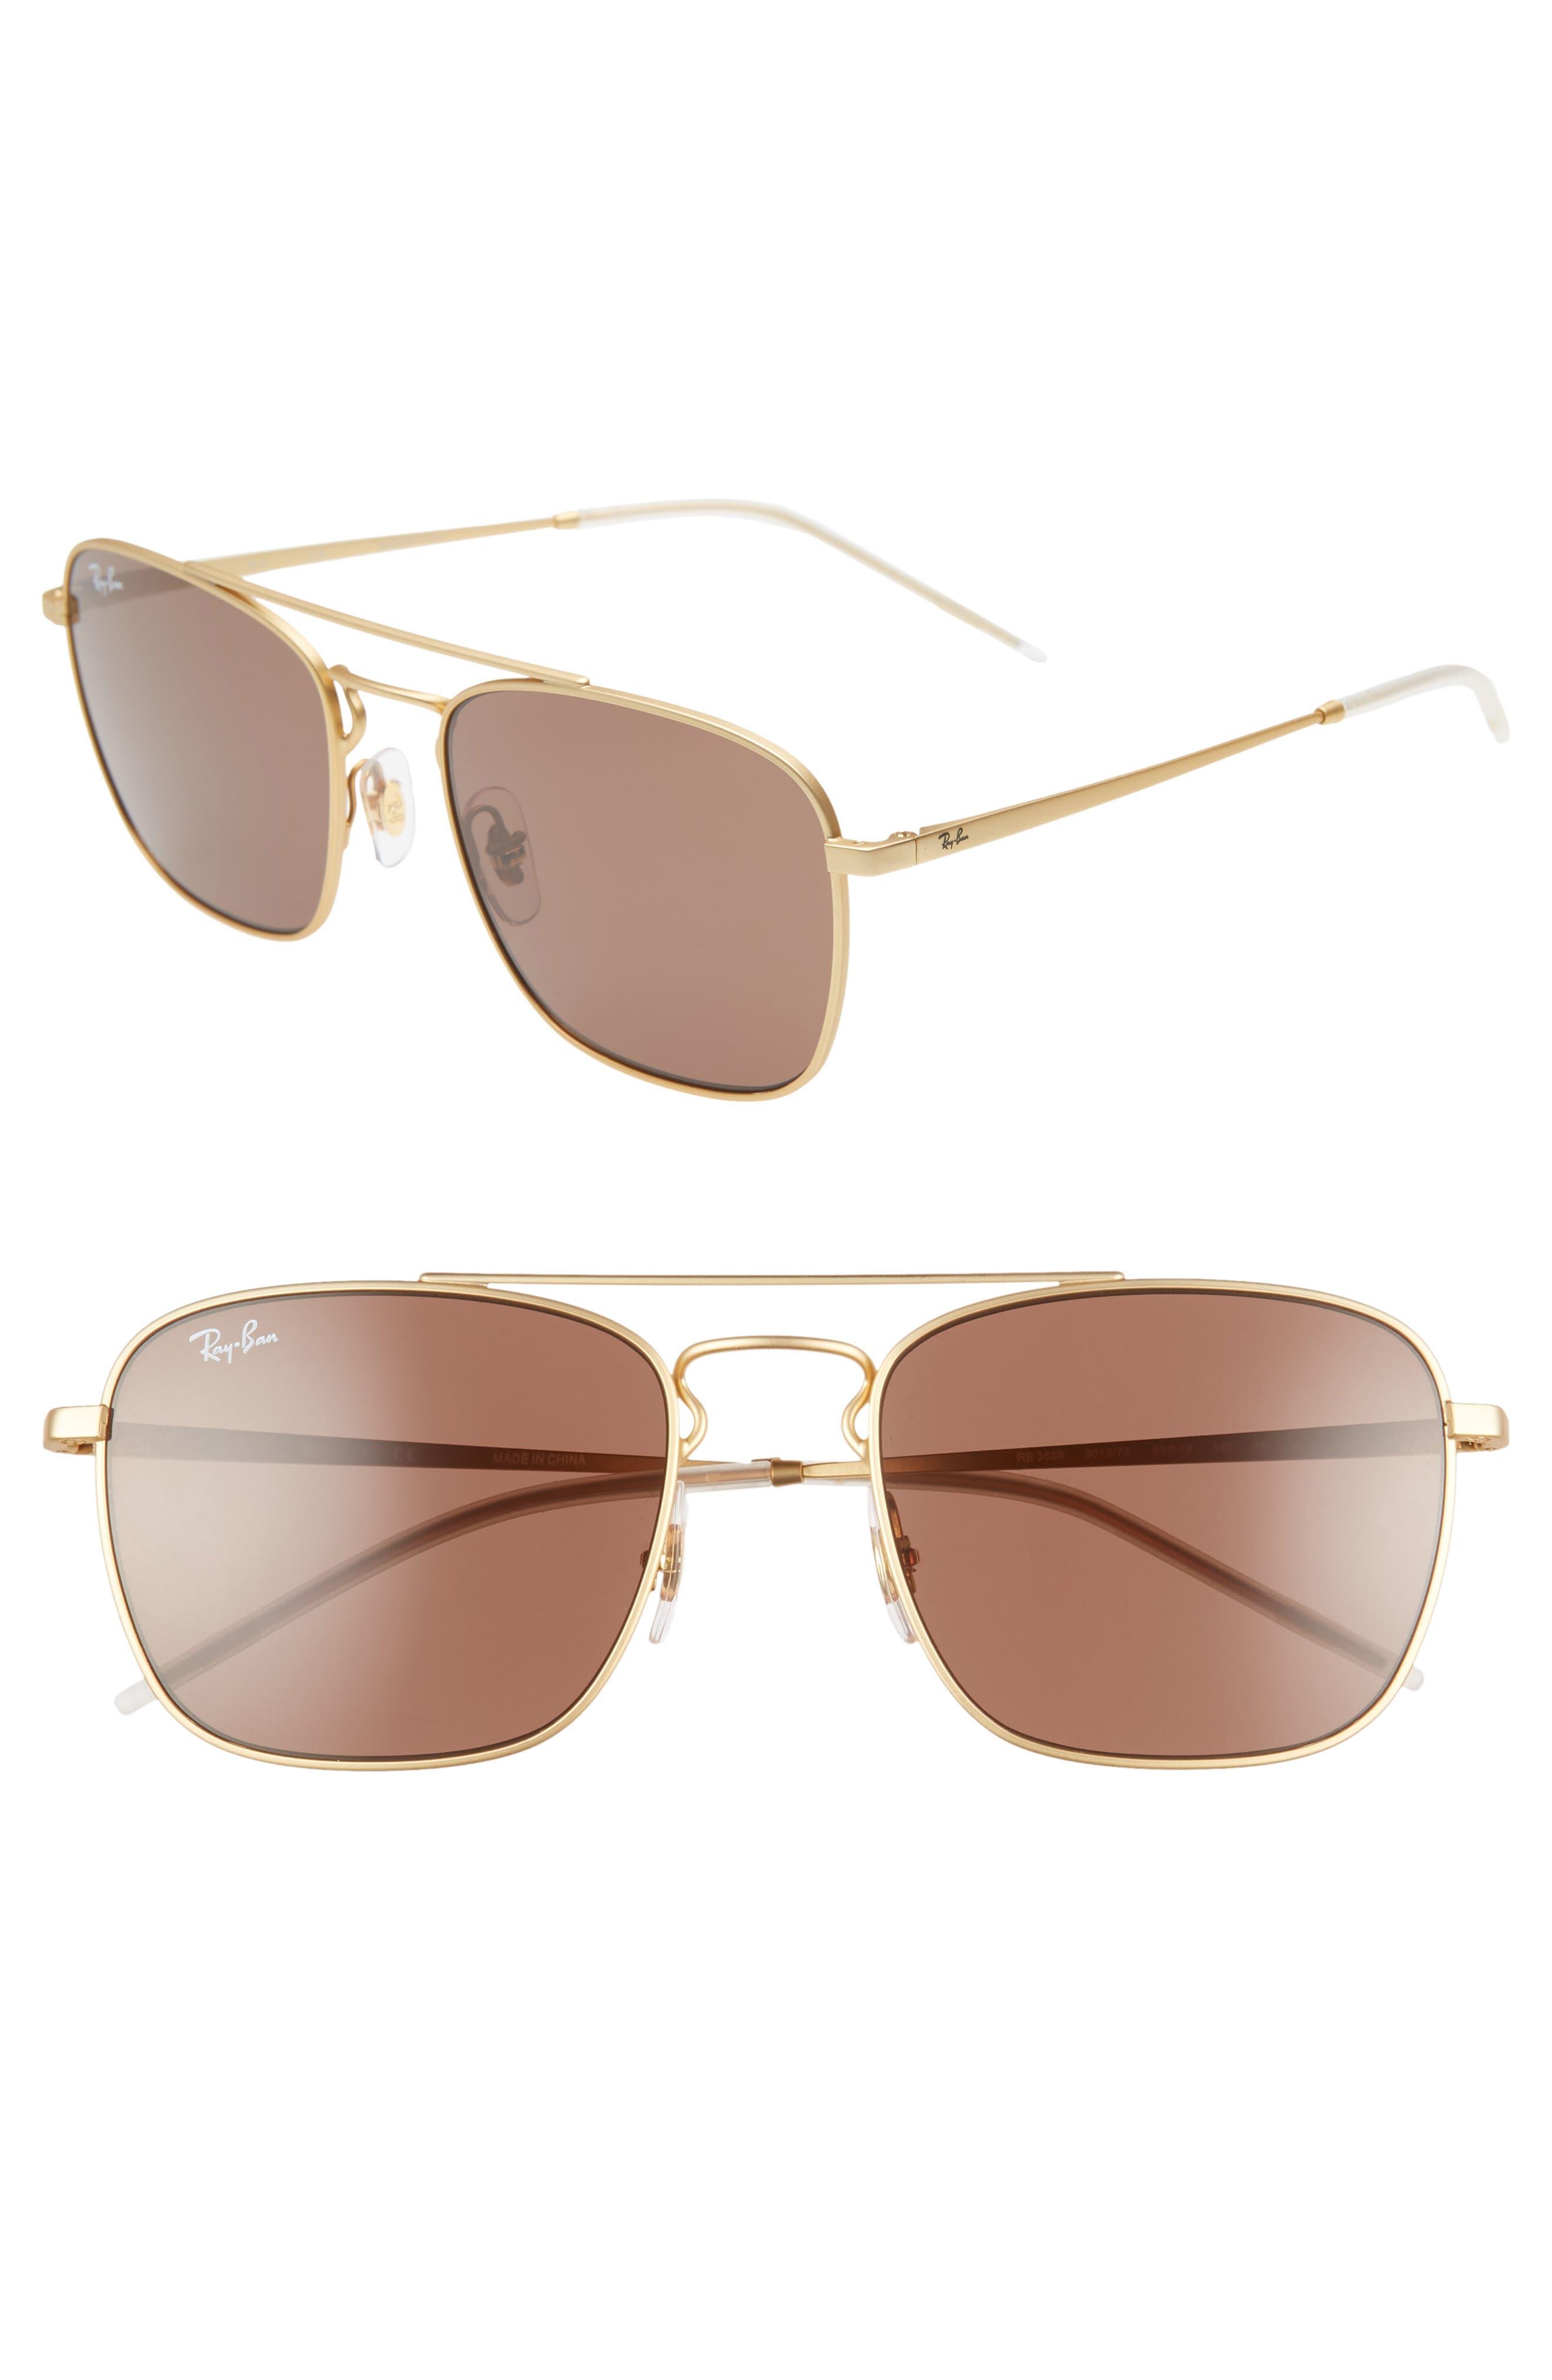 Ray-Ban 55Mm Navigator Sunglasses - Gold/ Brown Solid